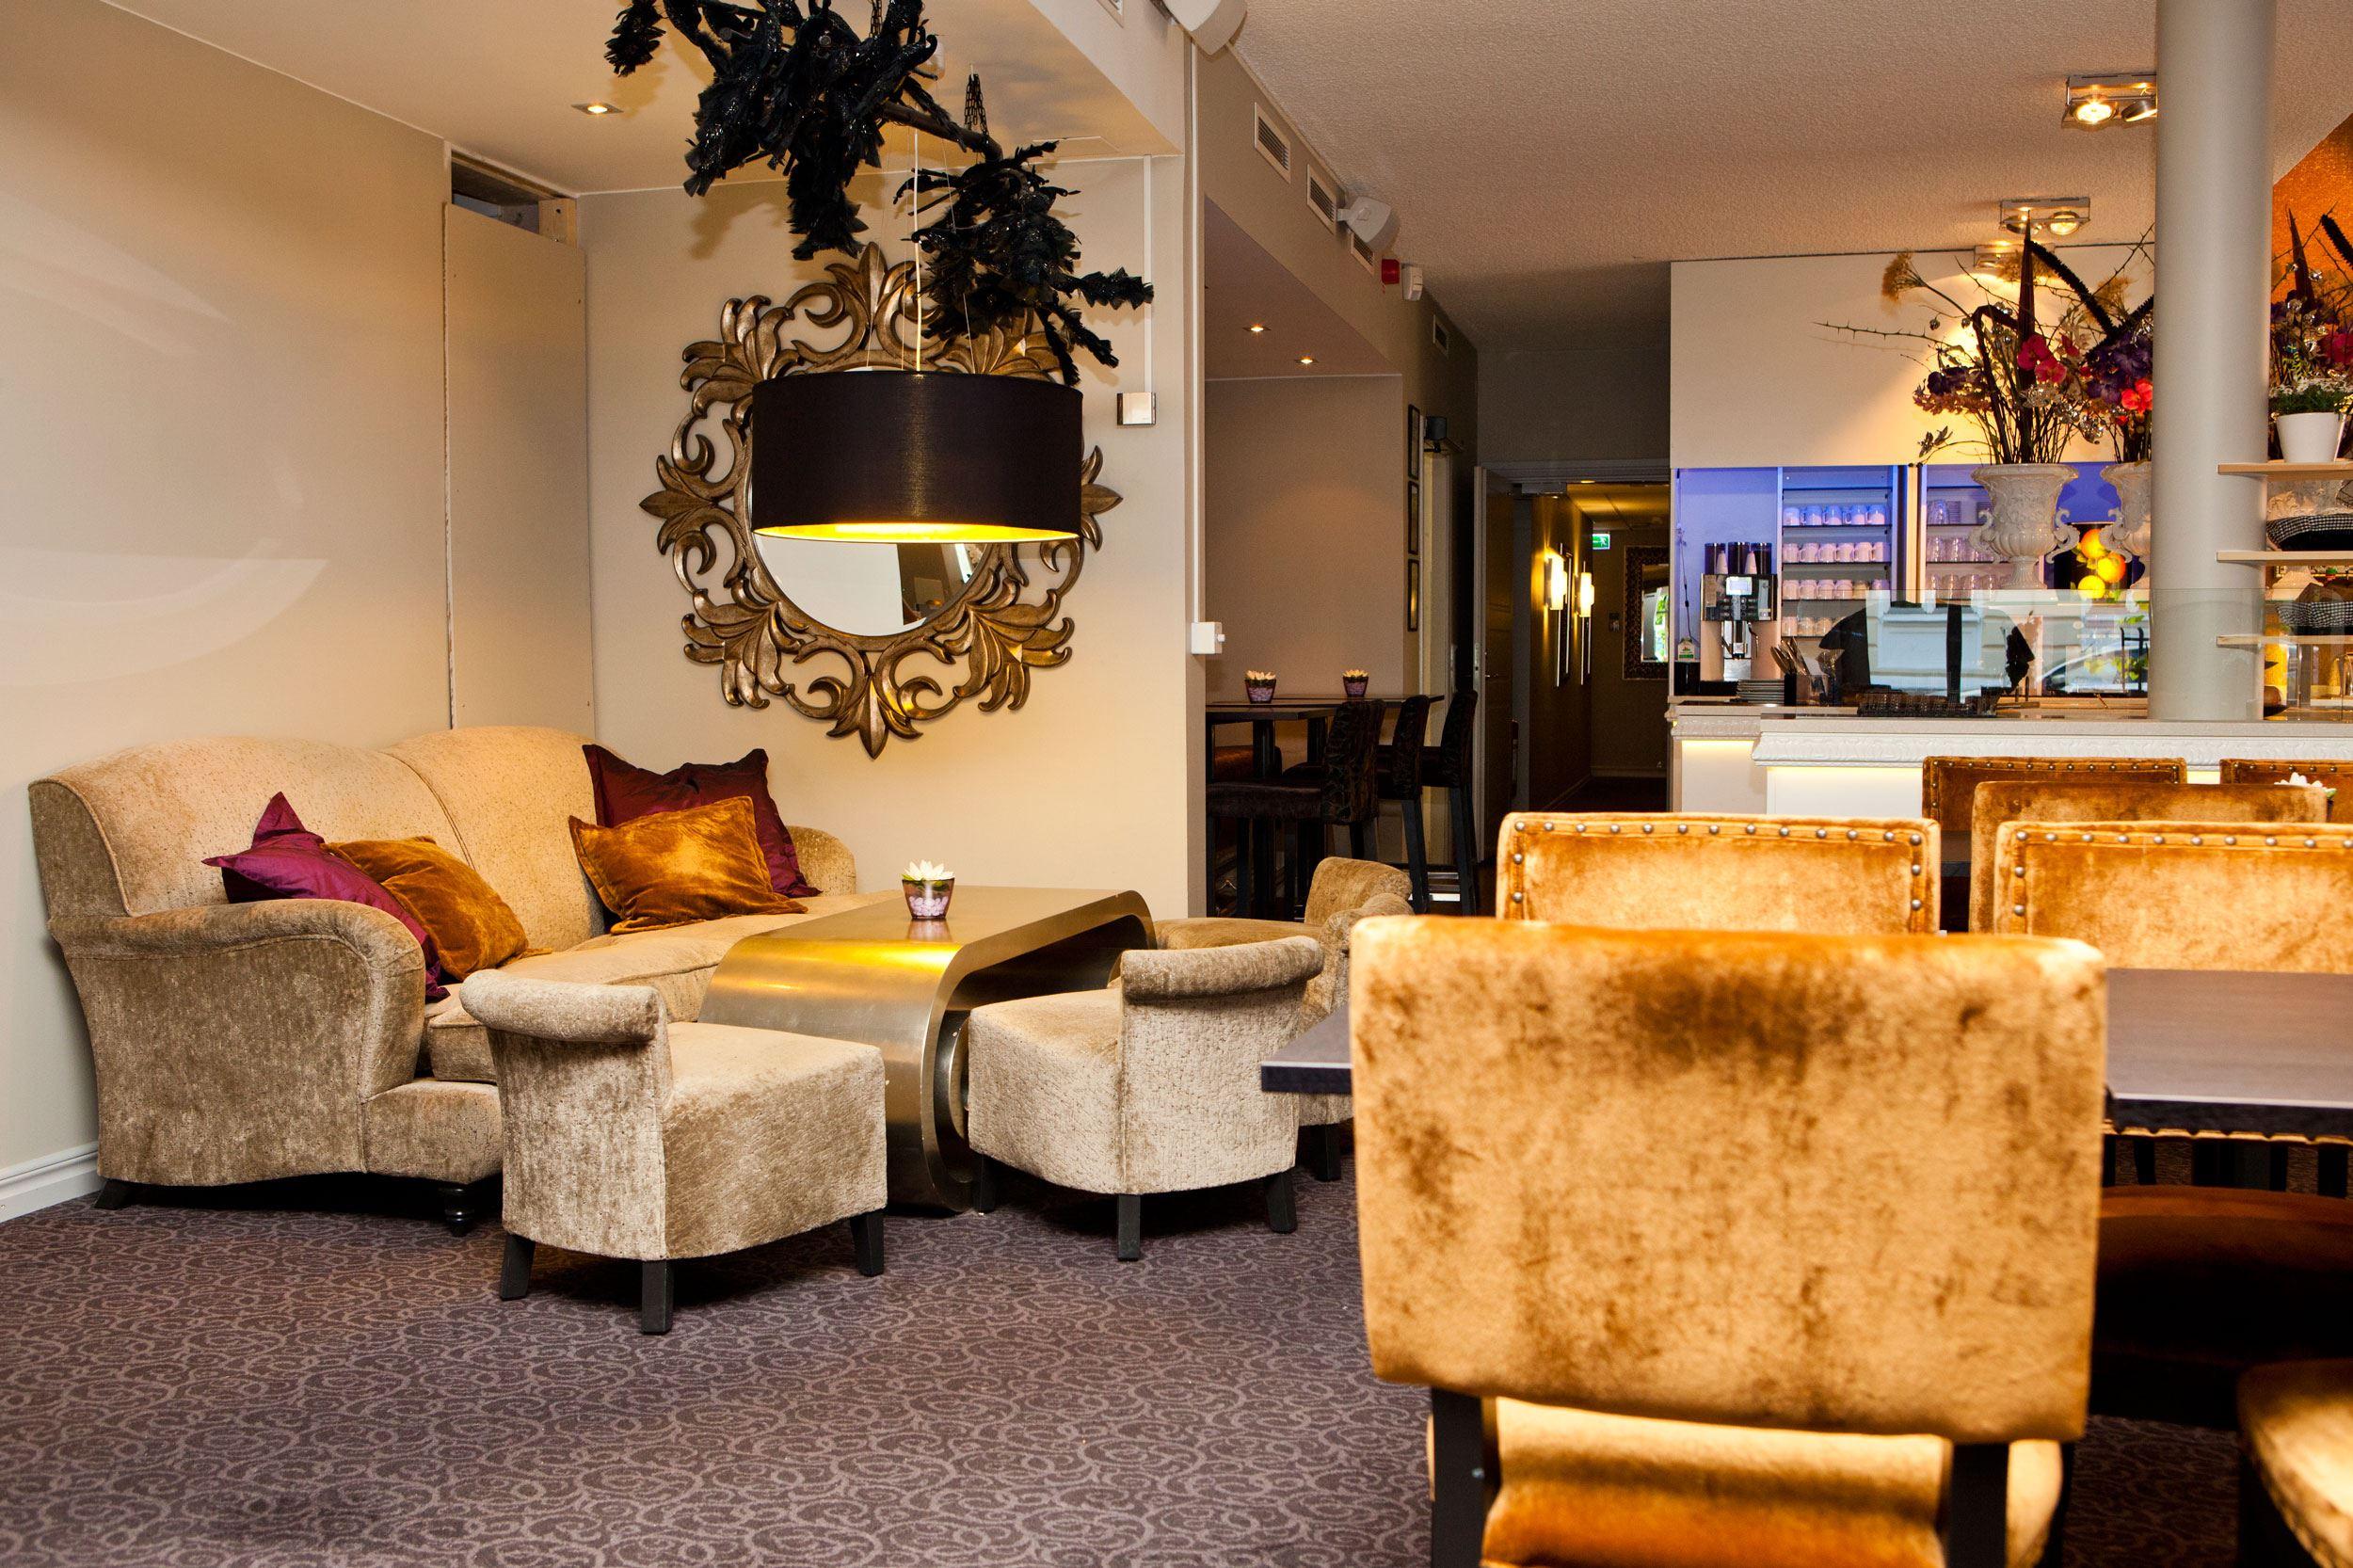 Clarion Collection Hotel Majoren, Skövde